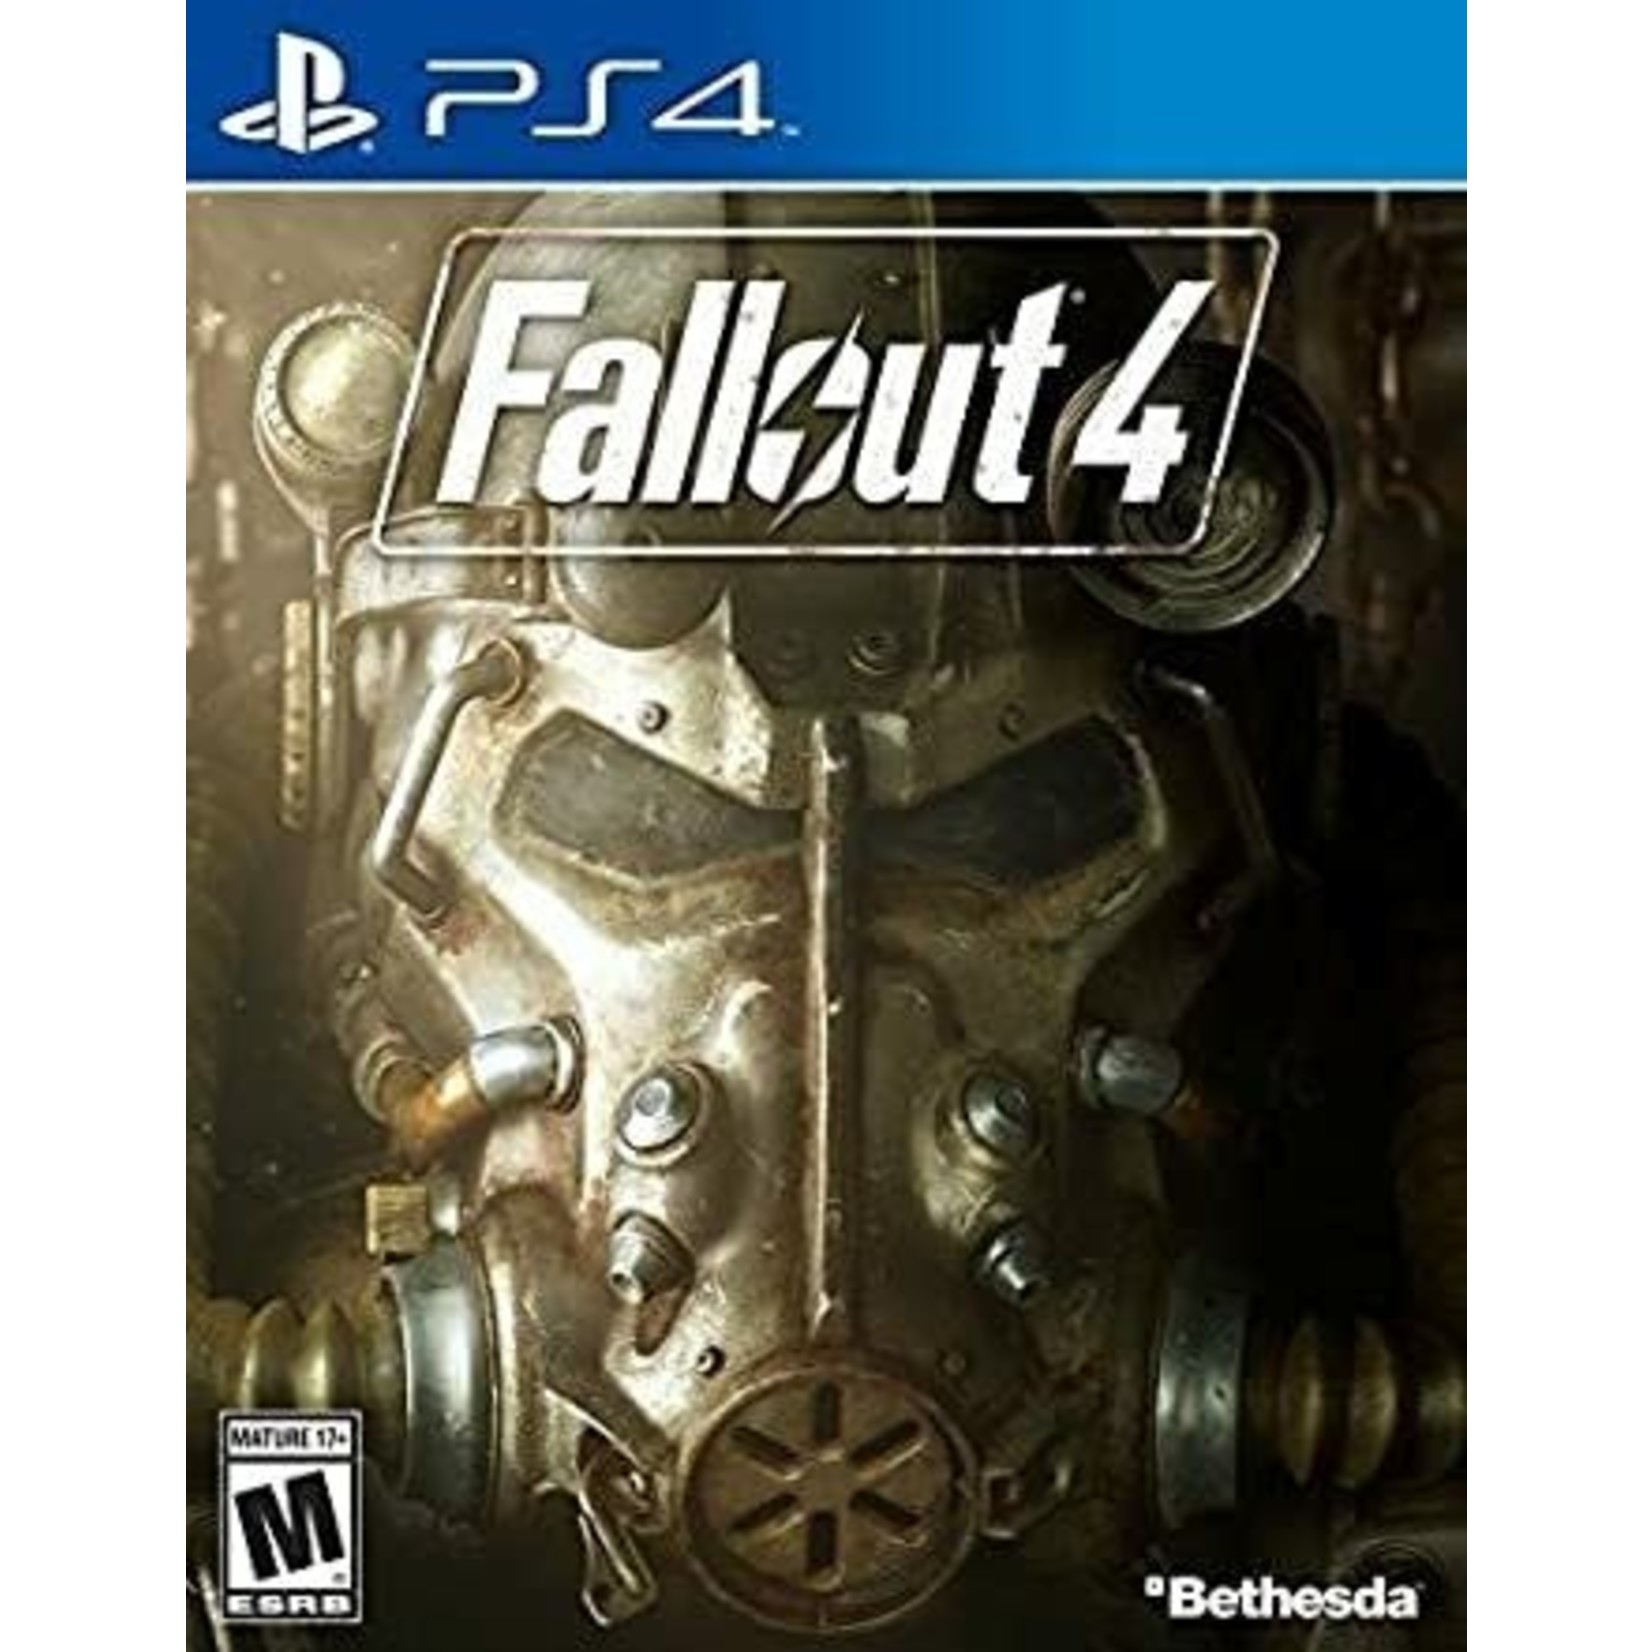 PS4U-Fallout 4